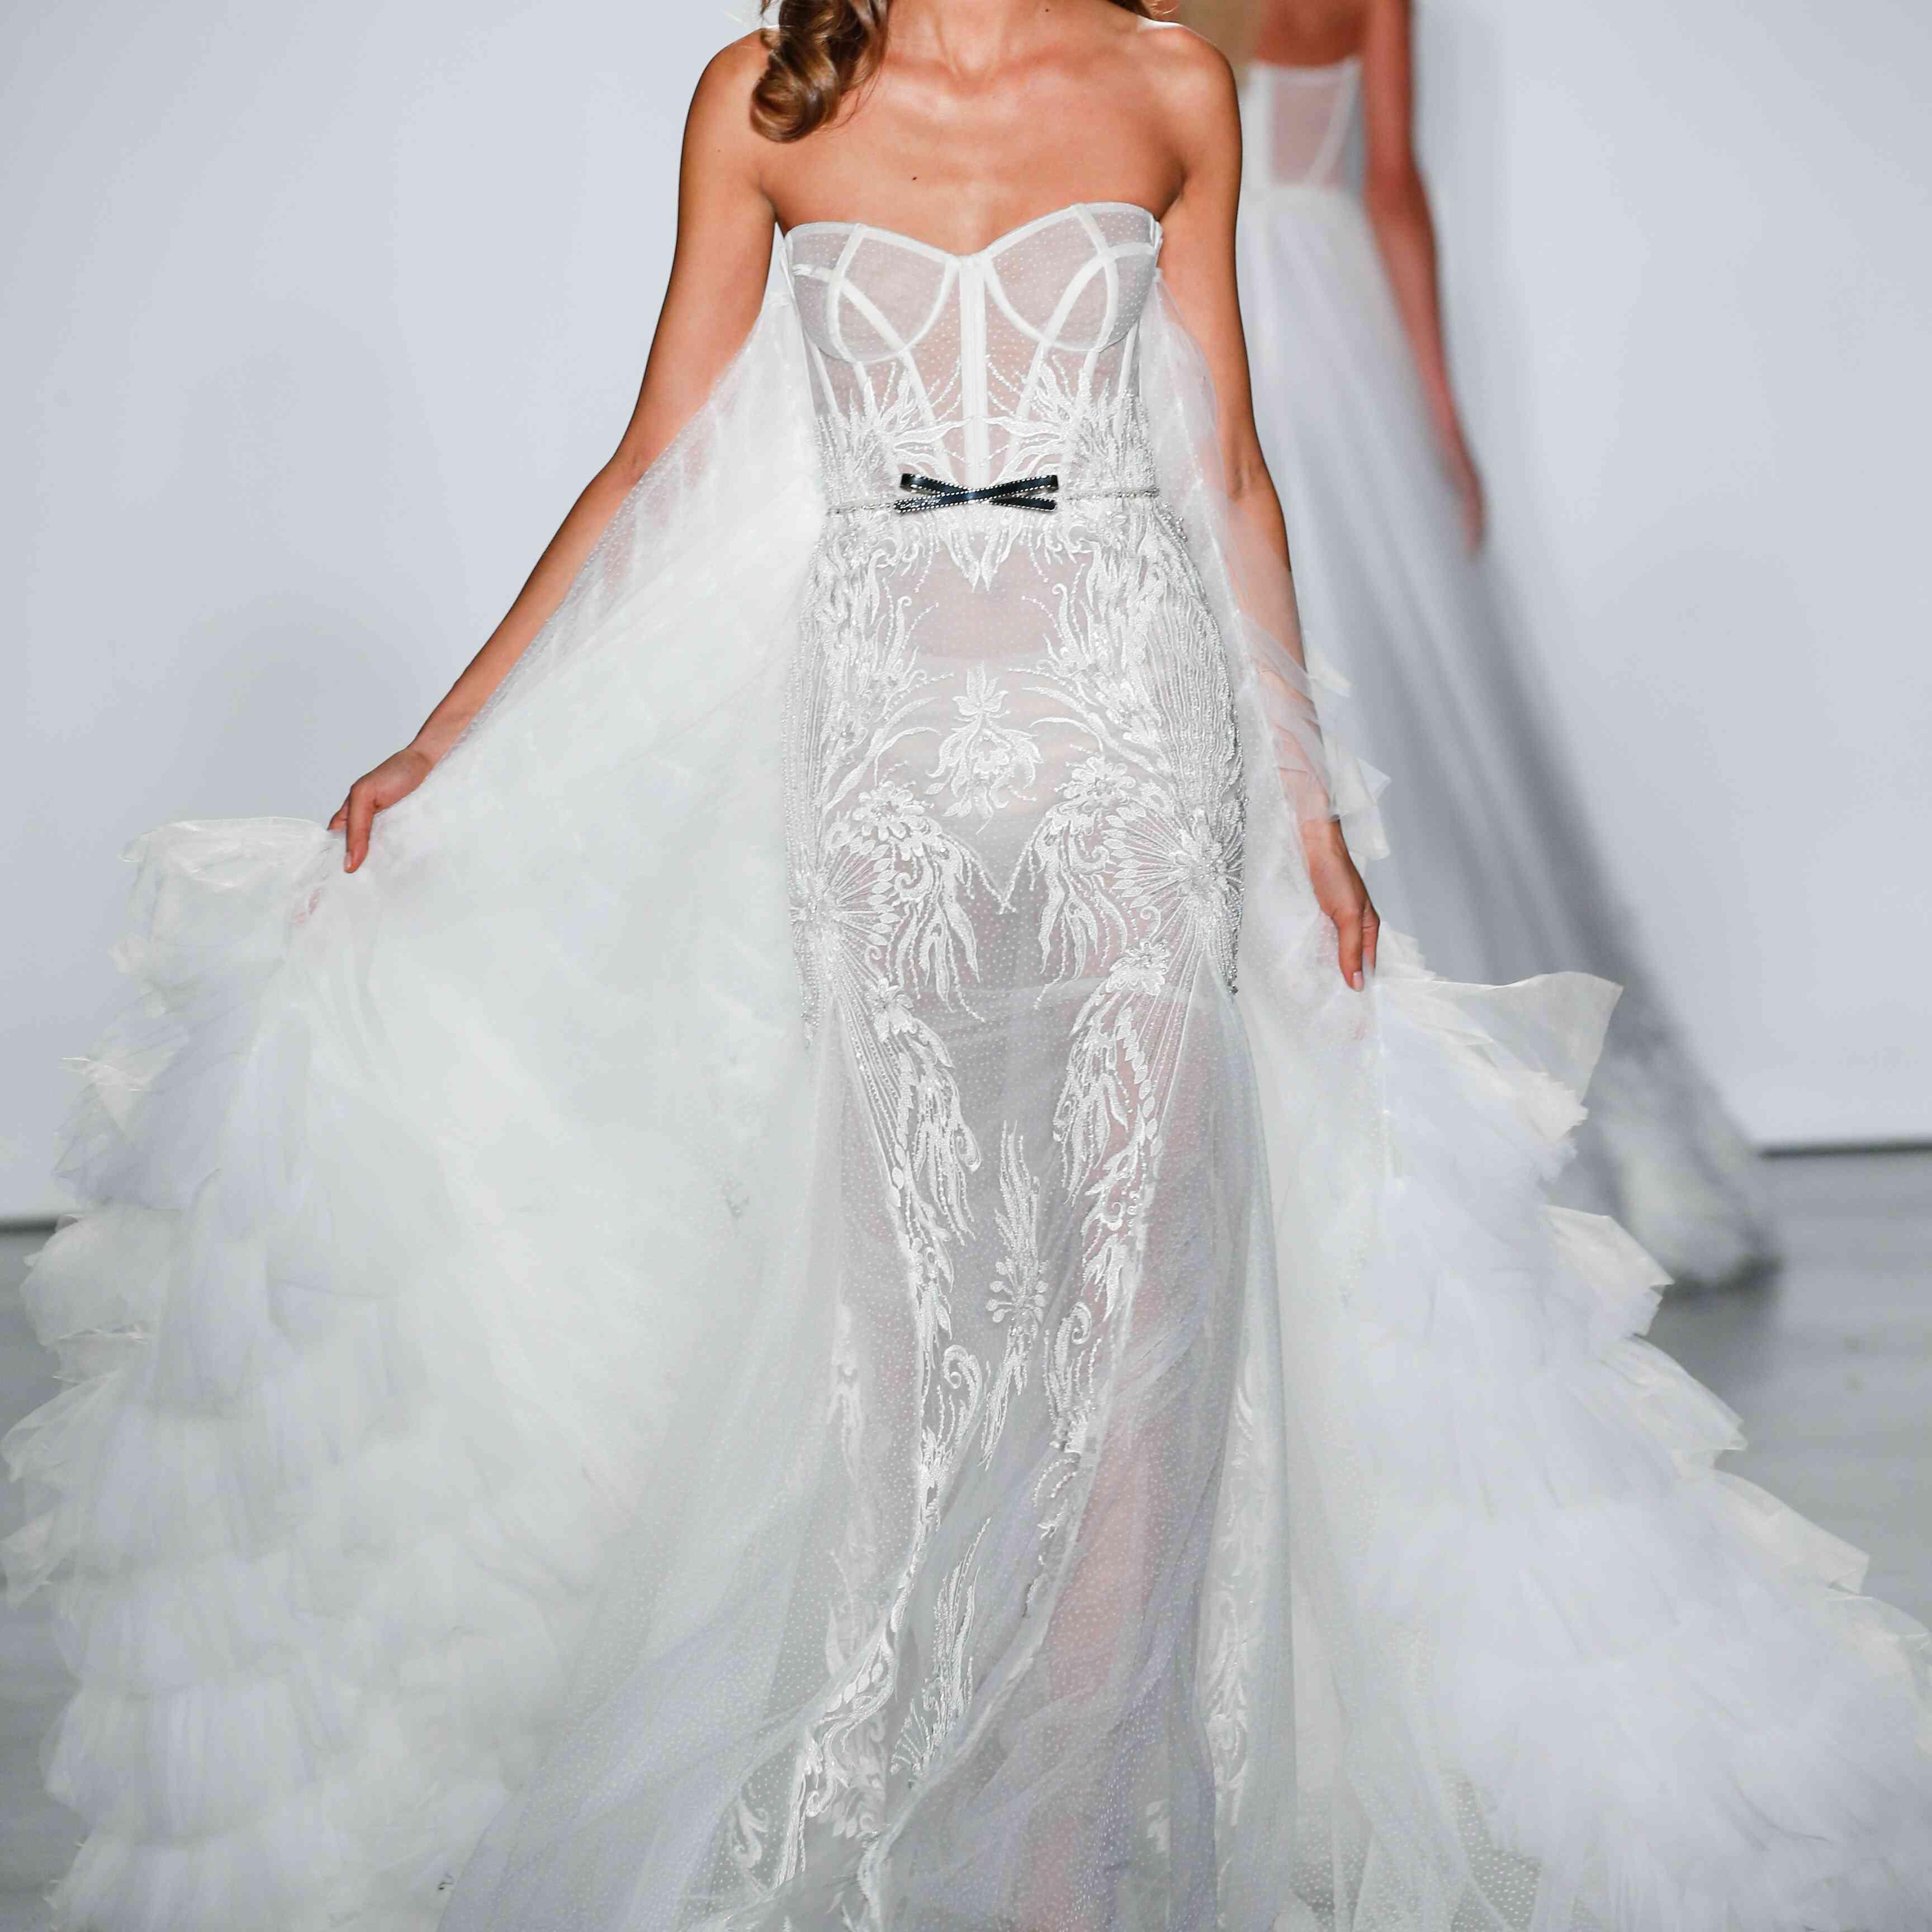 Model in Inbal Dror VIP wedding dress with tiered ruffle train